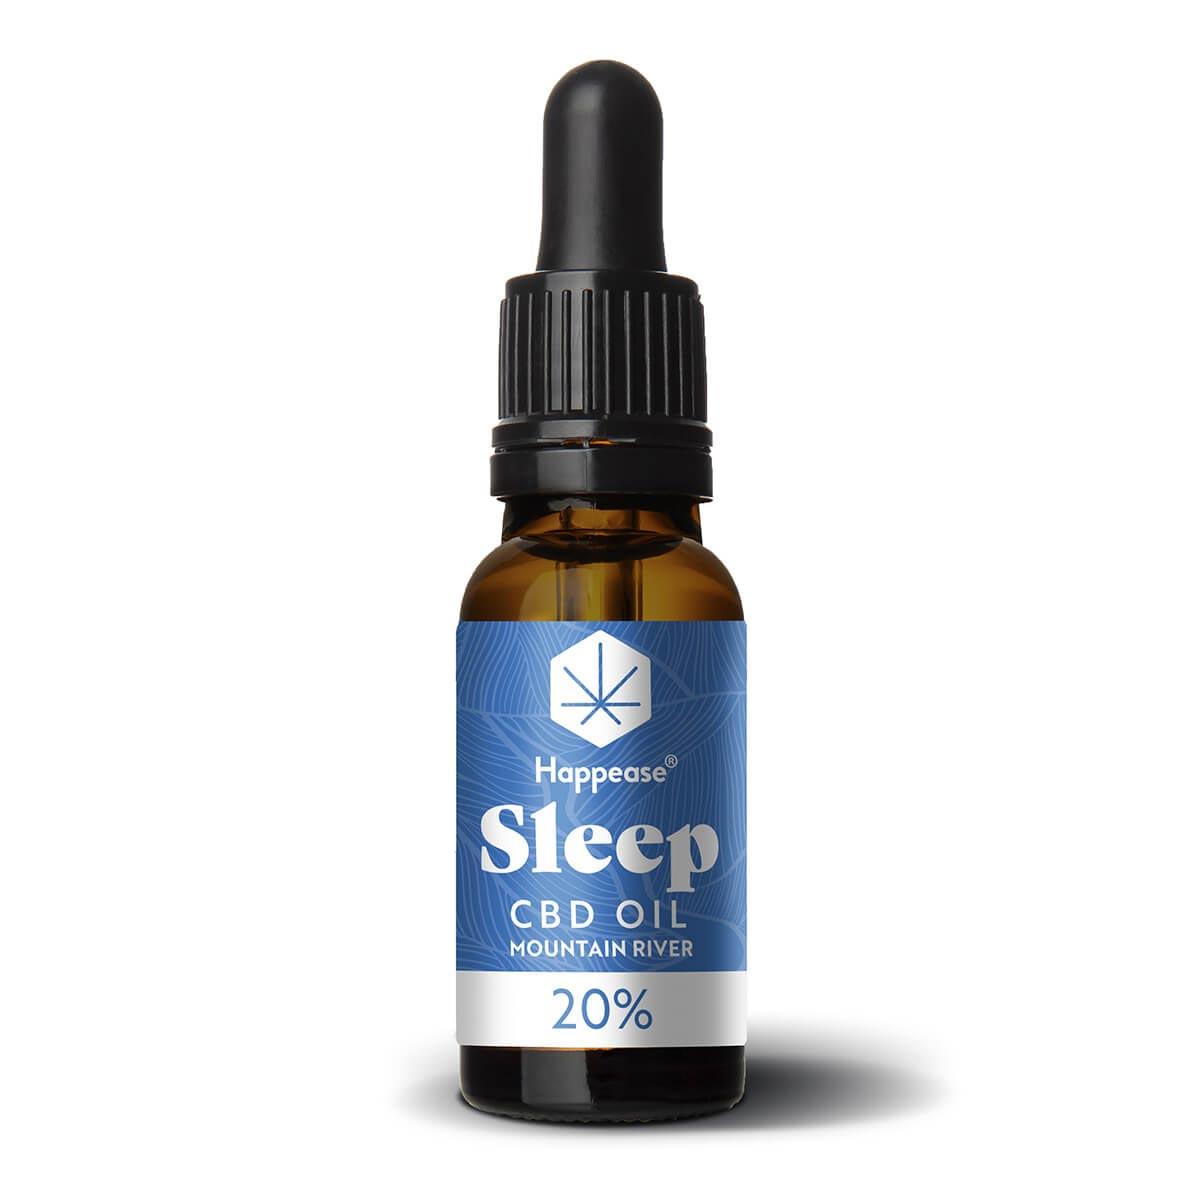 Huile CBD 20% Sleep Happease